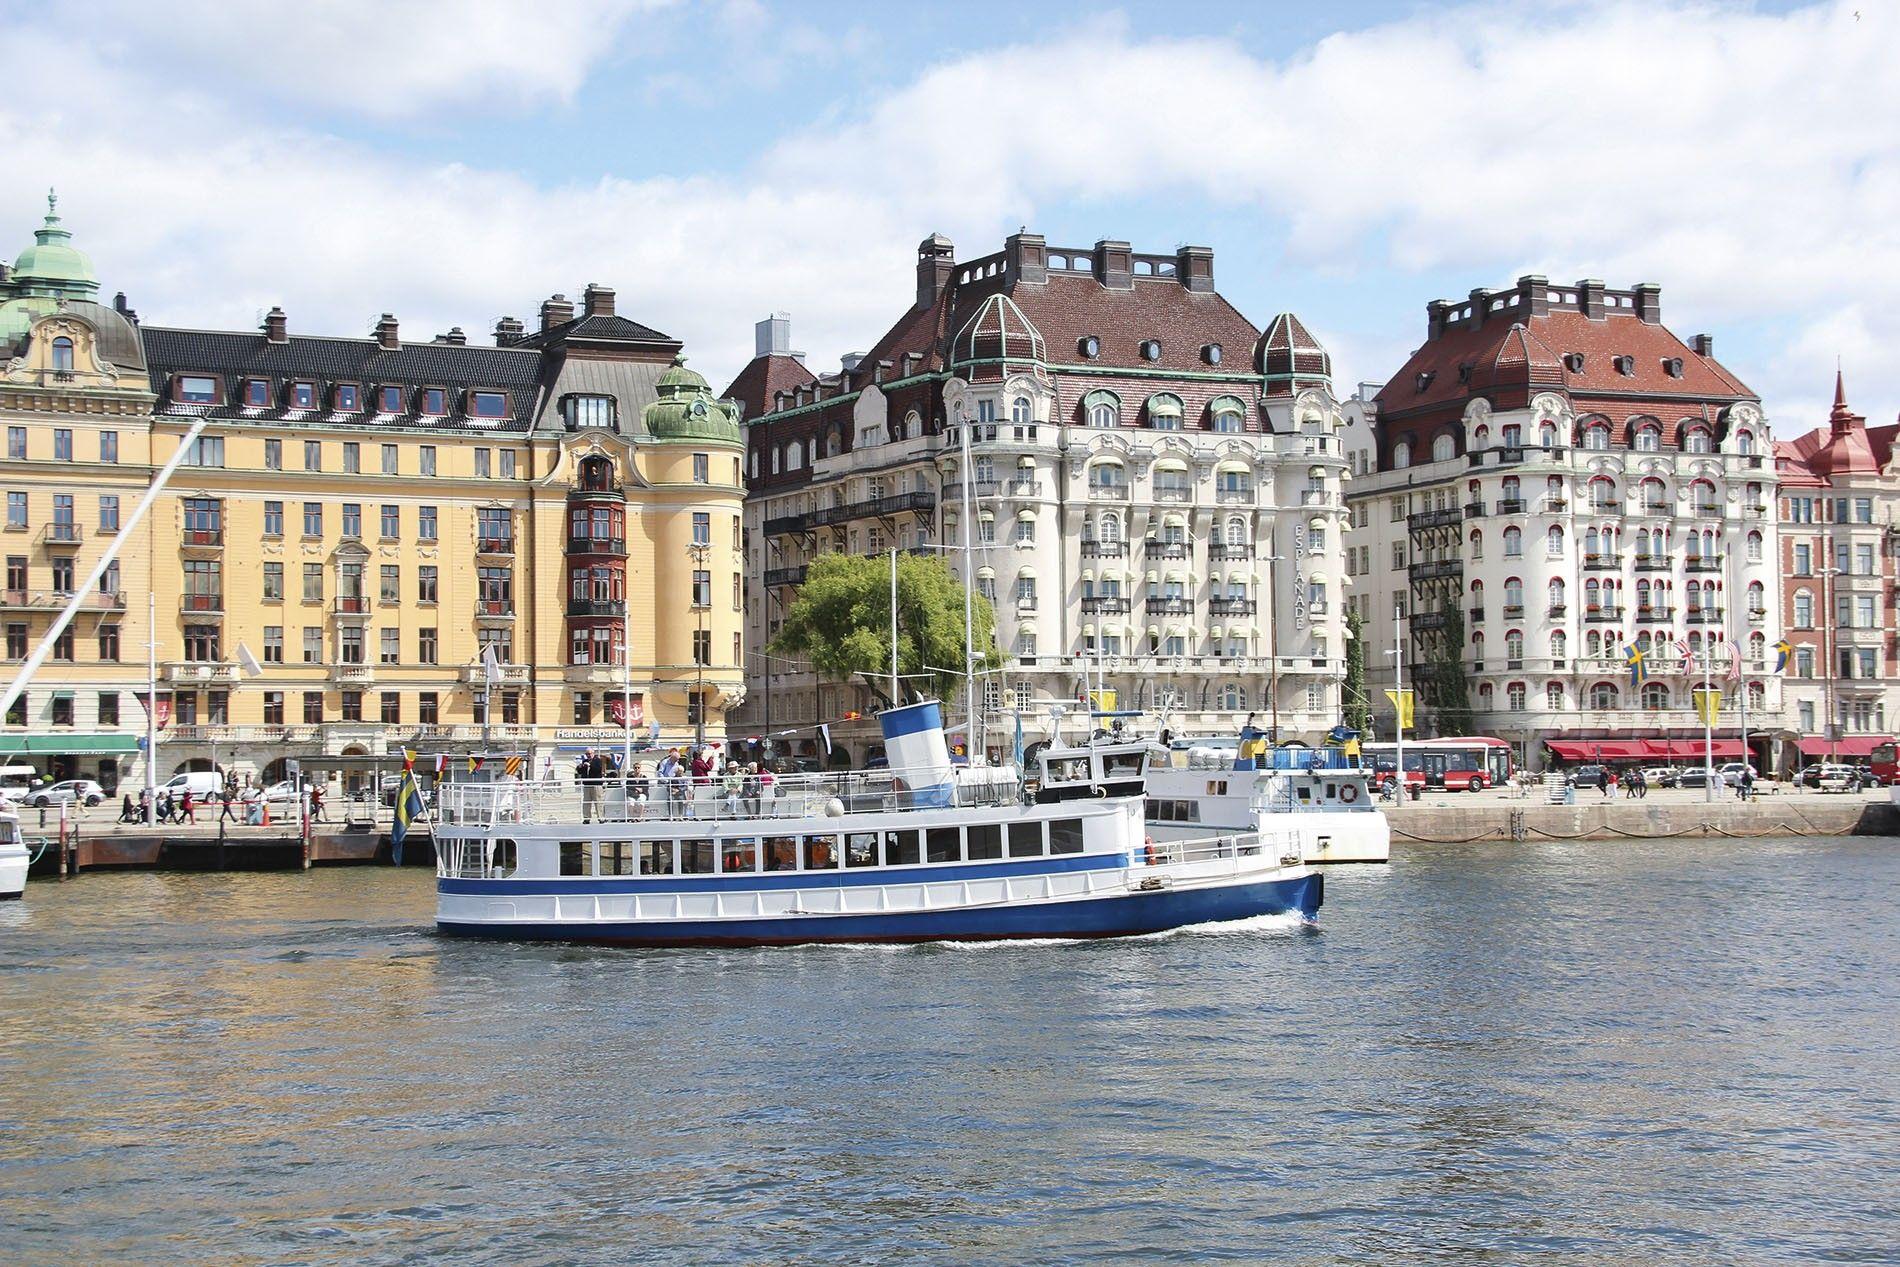 The waterways of Stockholm